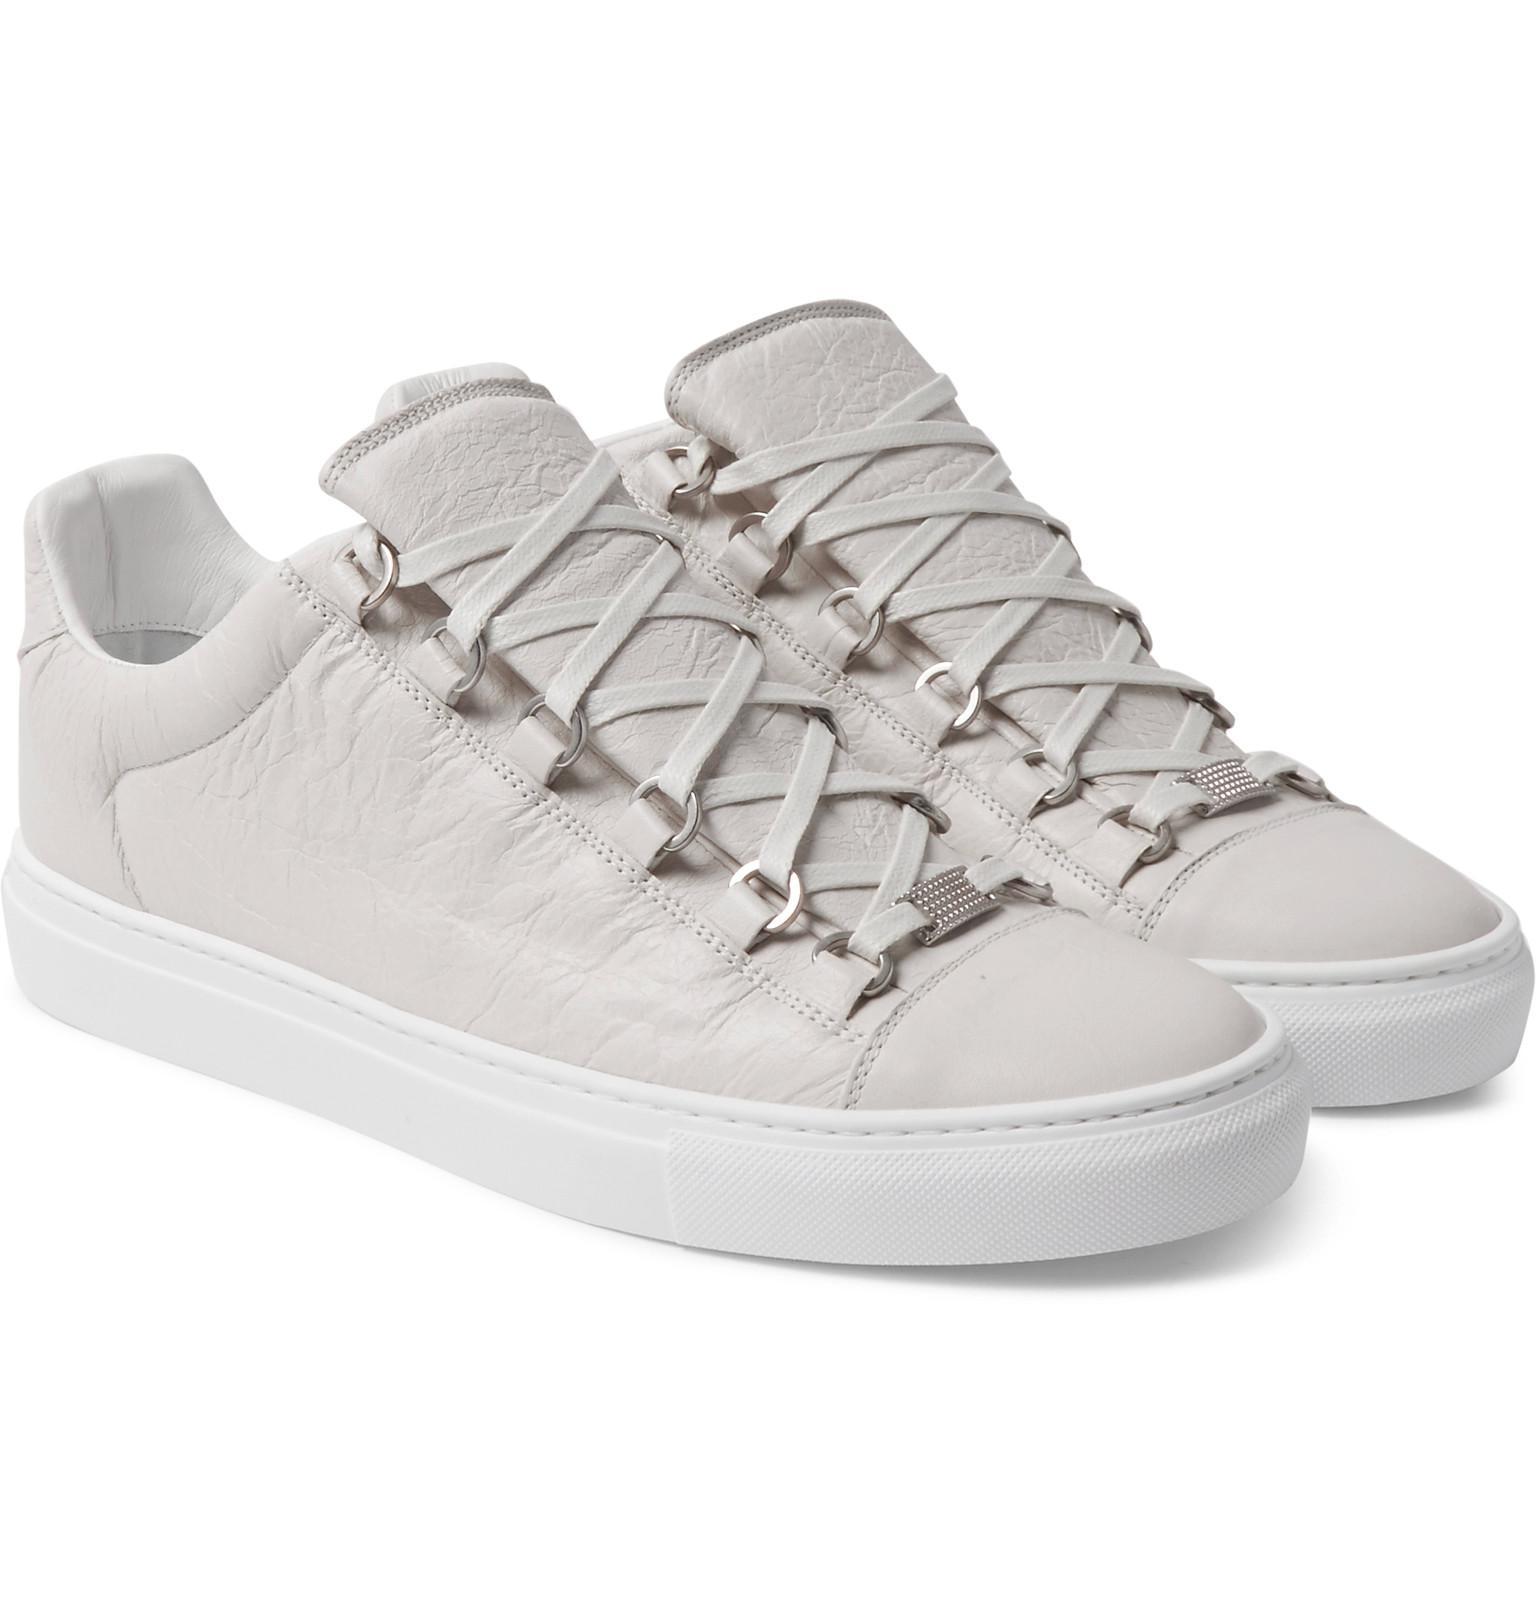 Balenciaga Arena Low-top Leather